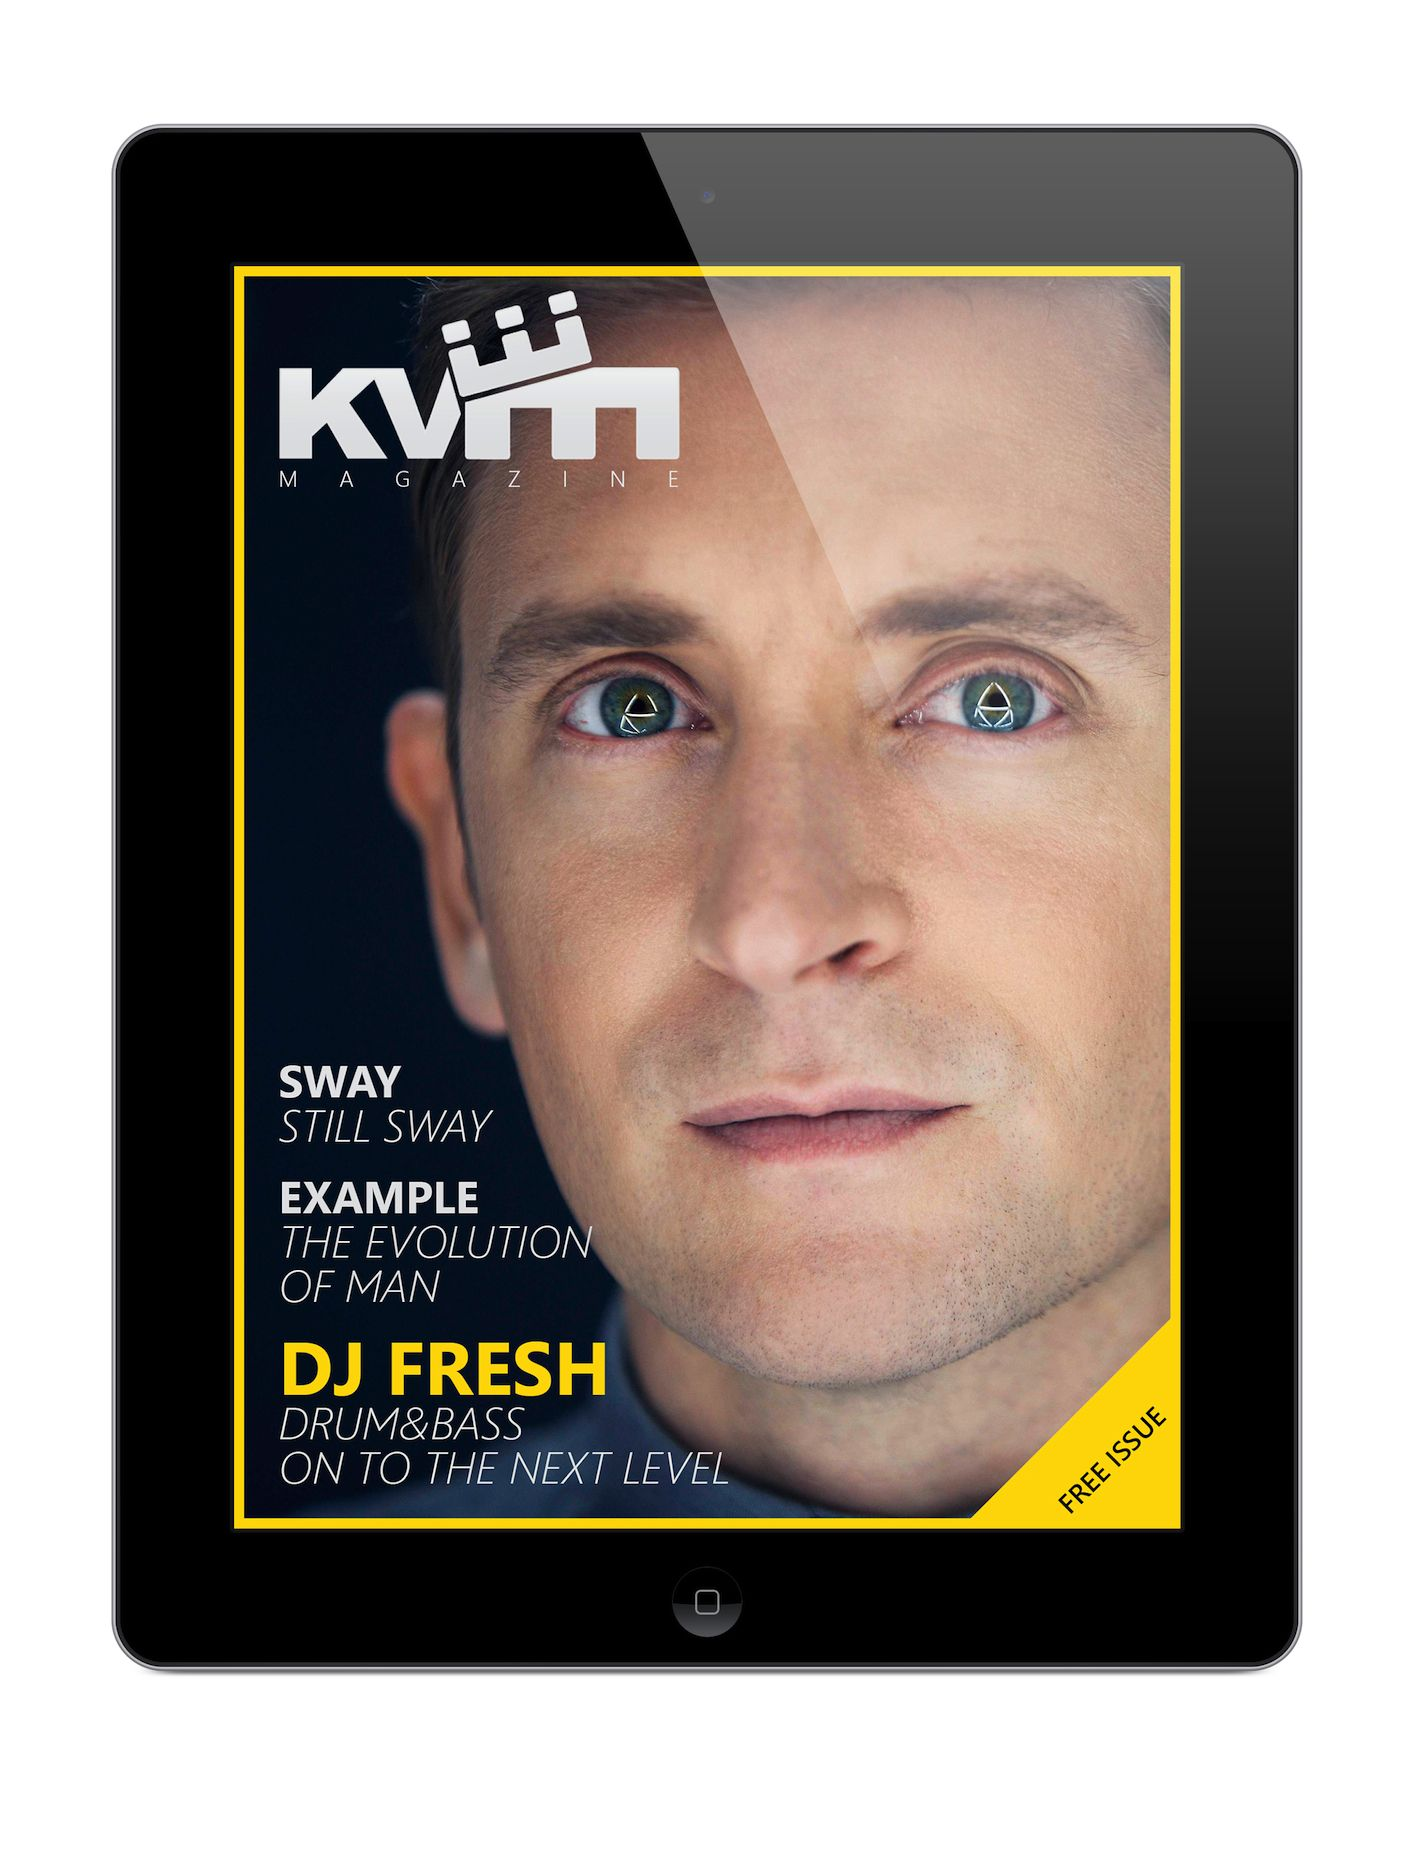 KVM iPad Magazine issue 1 cover